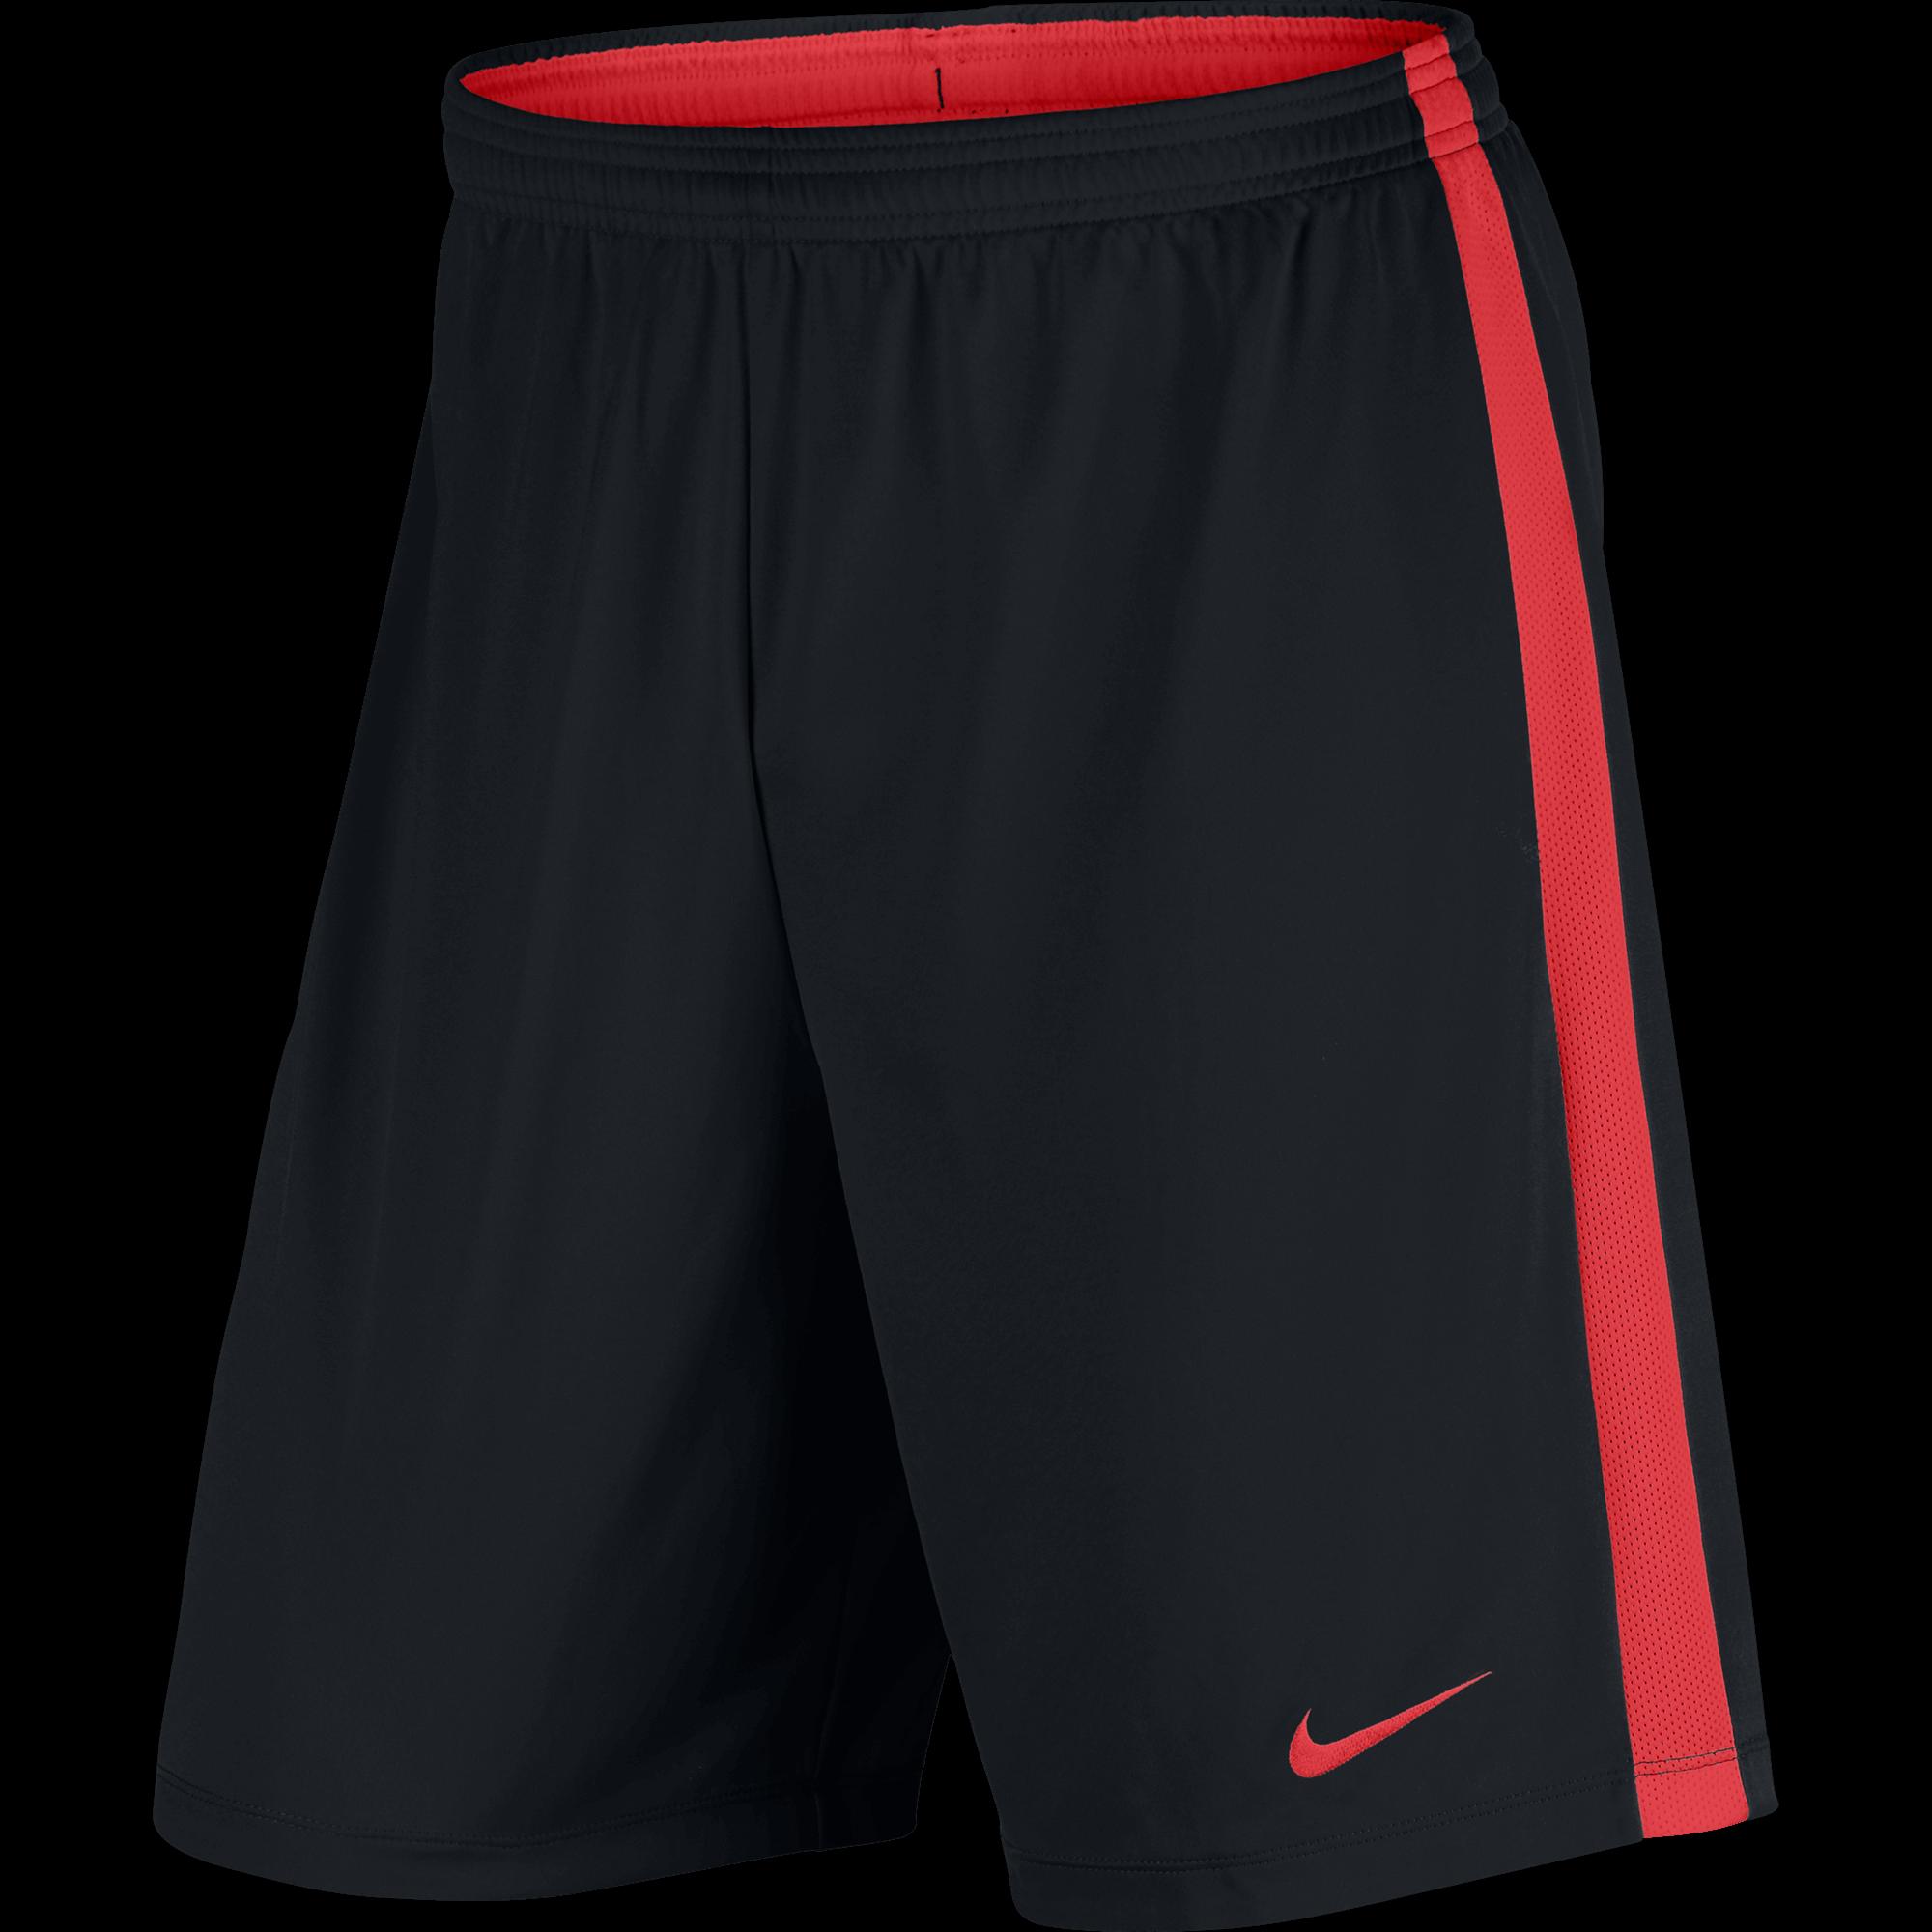 Nike Dry Academy Voetbalbroekje Black